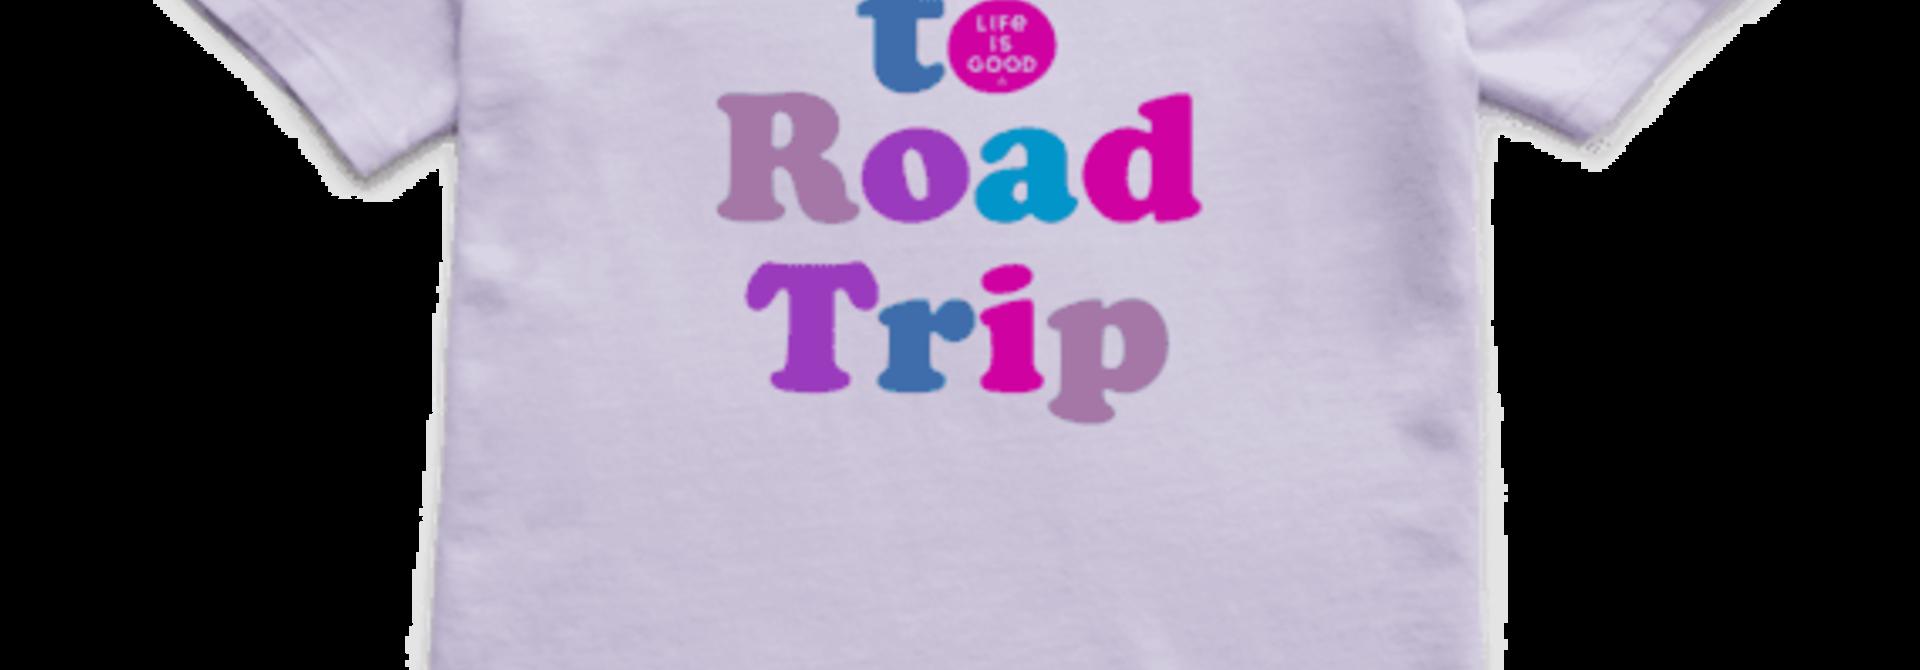 Ready to Road Trip LIG T-shirt